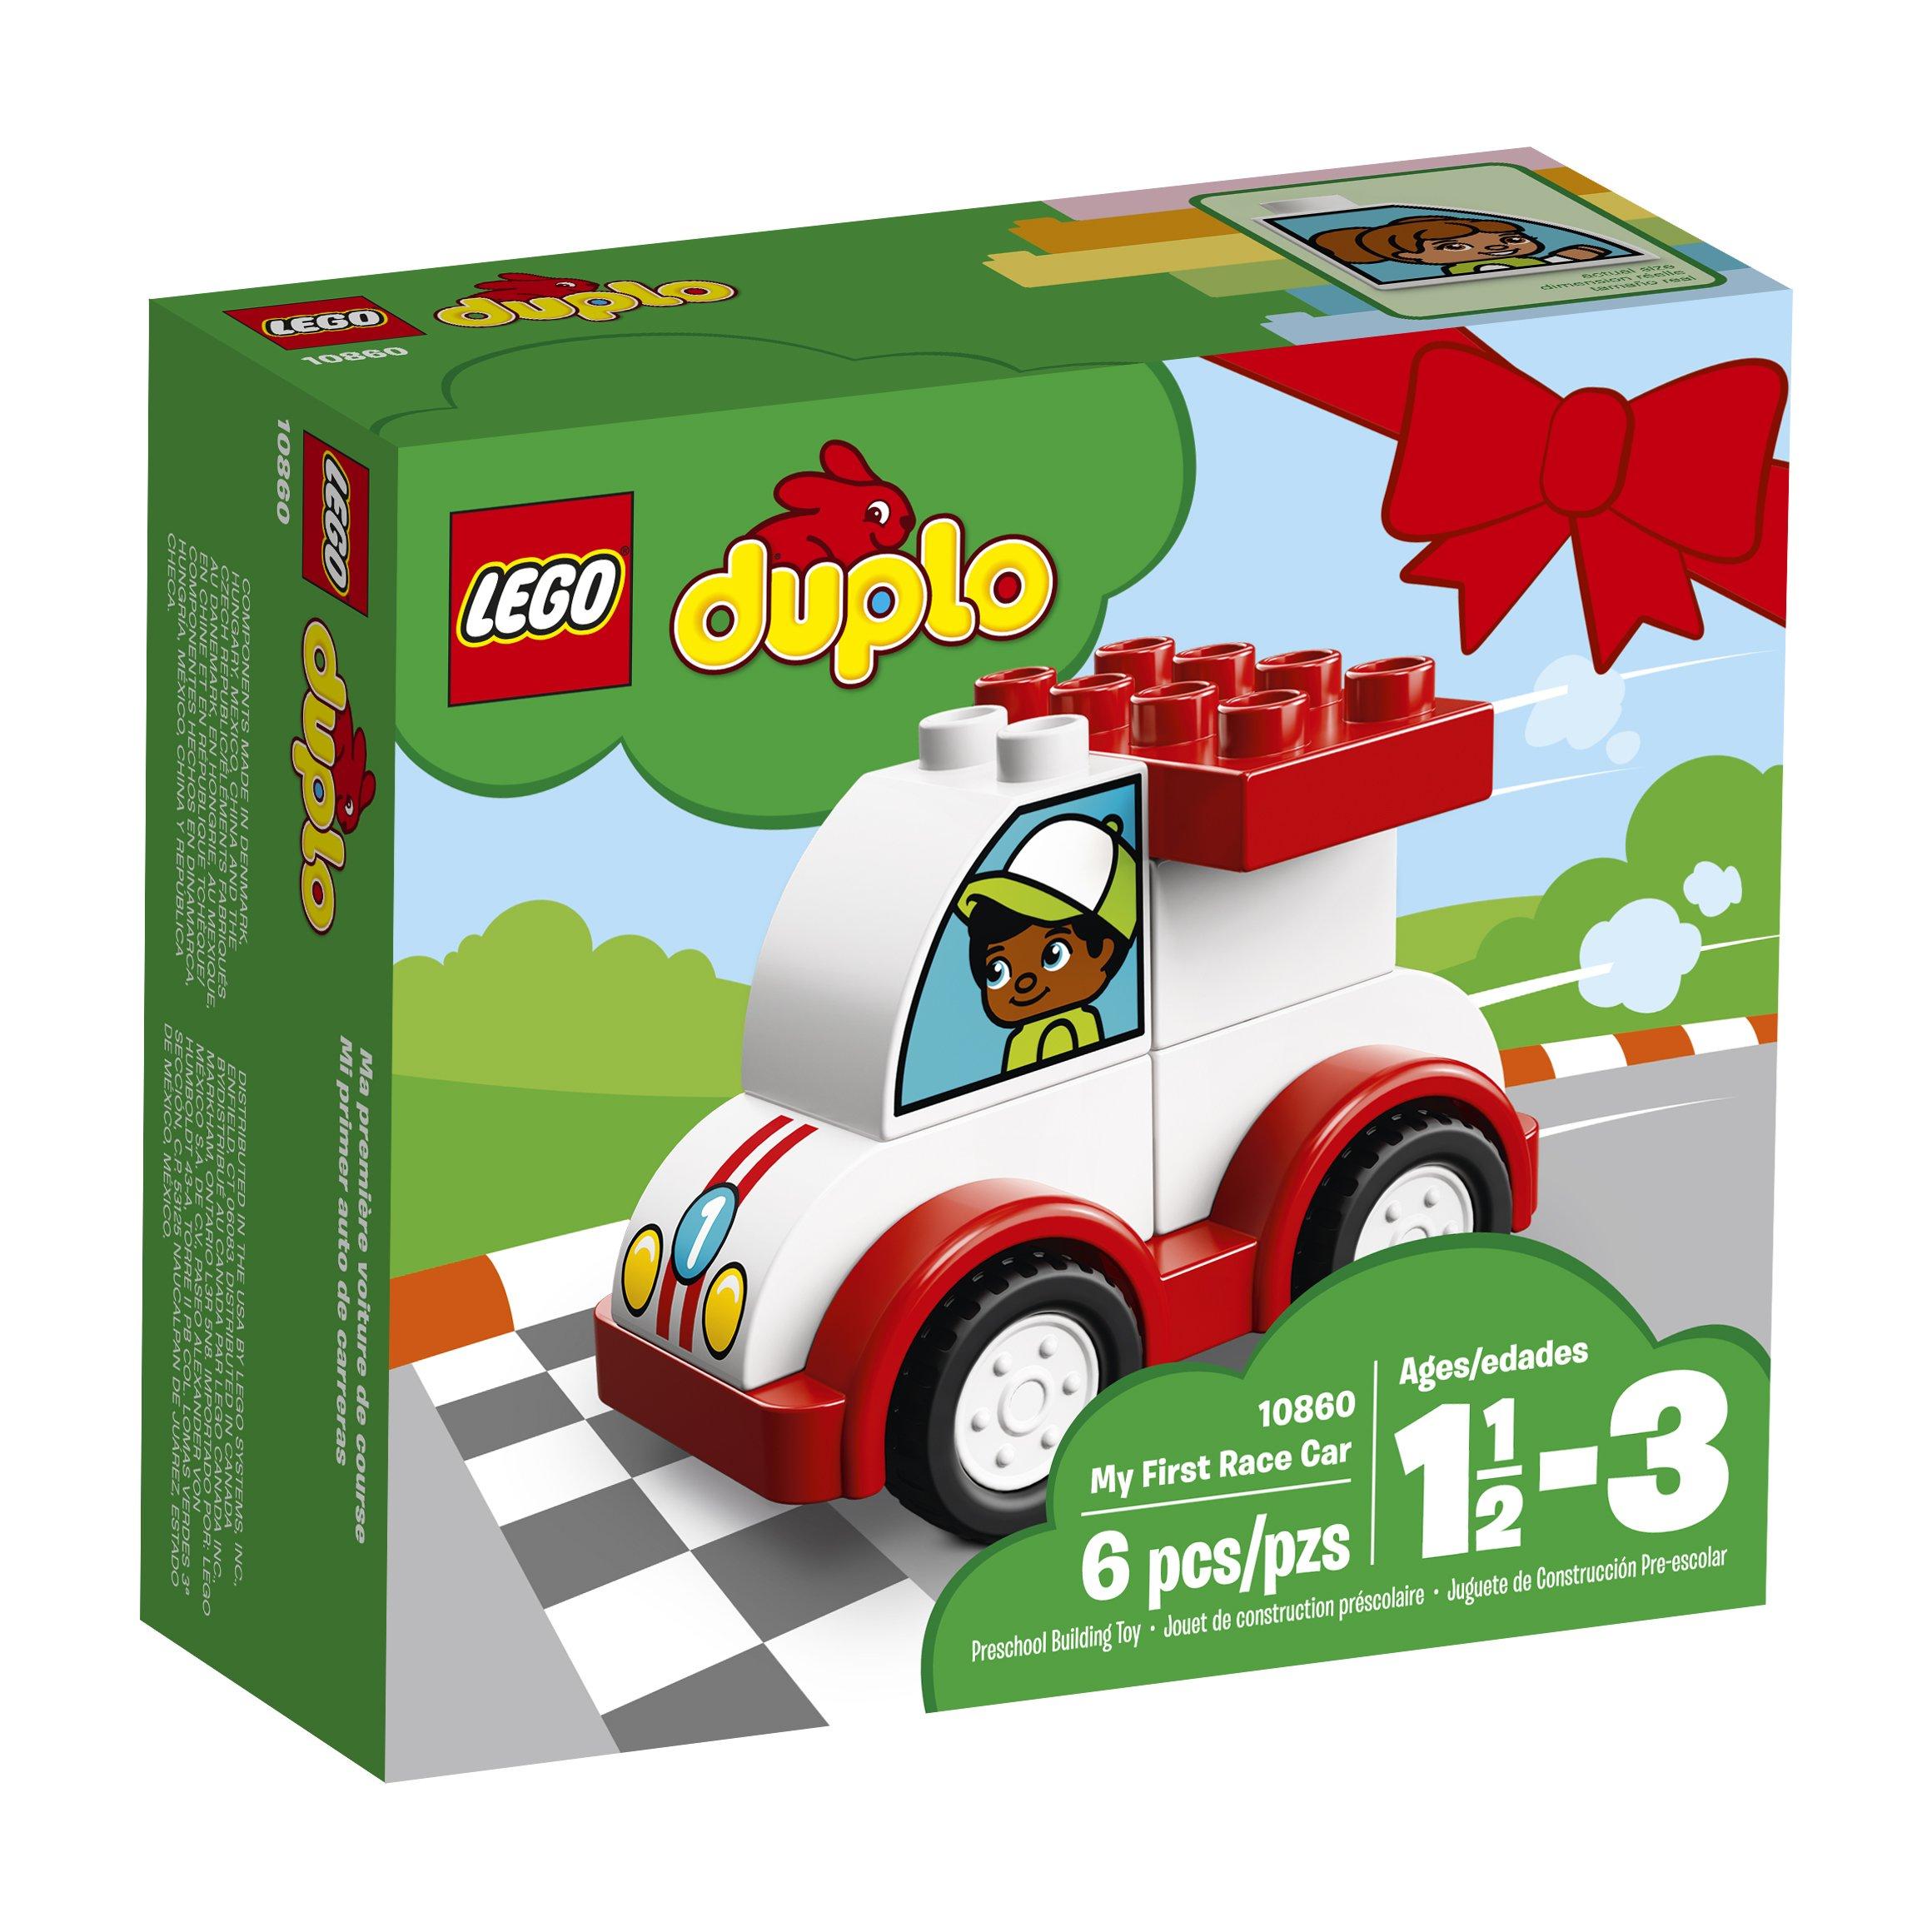 Mi primer auto de carreras LEGO | SEARS.COM.MX - Me entiende!